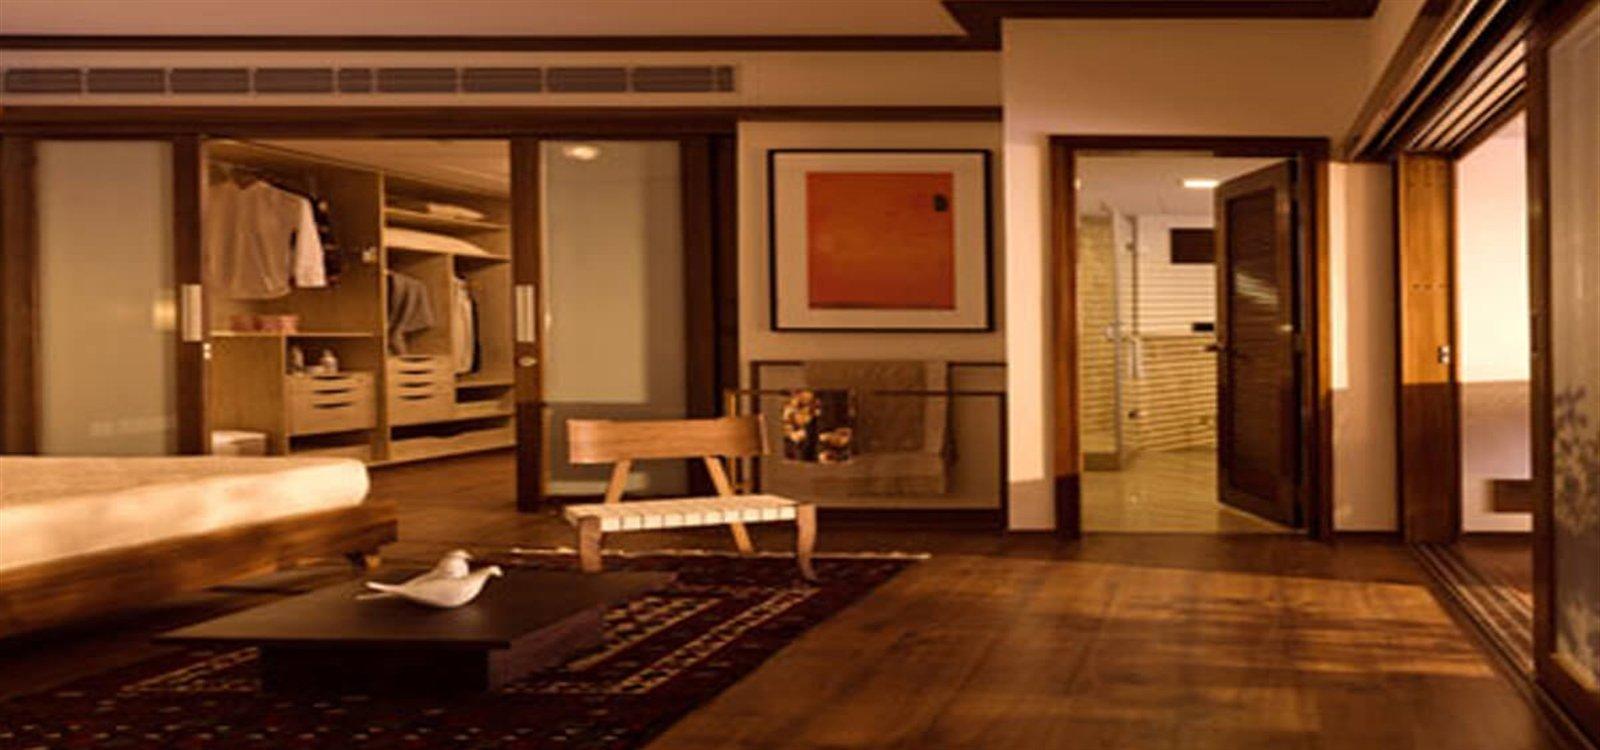 The Magic Faraway Tree apartments in Kanakapura| Luxuryproperties.in